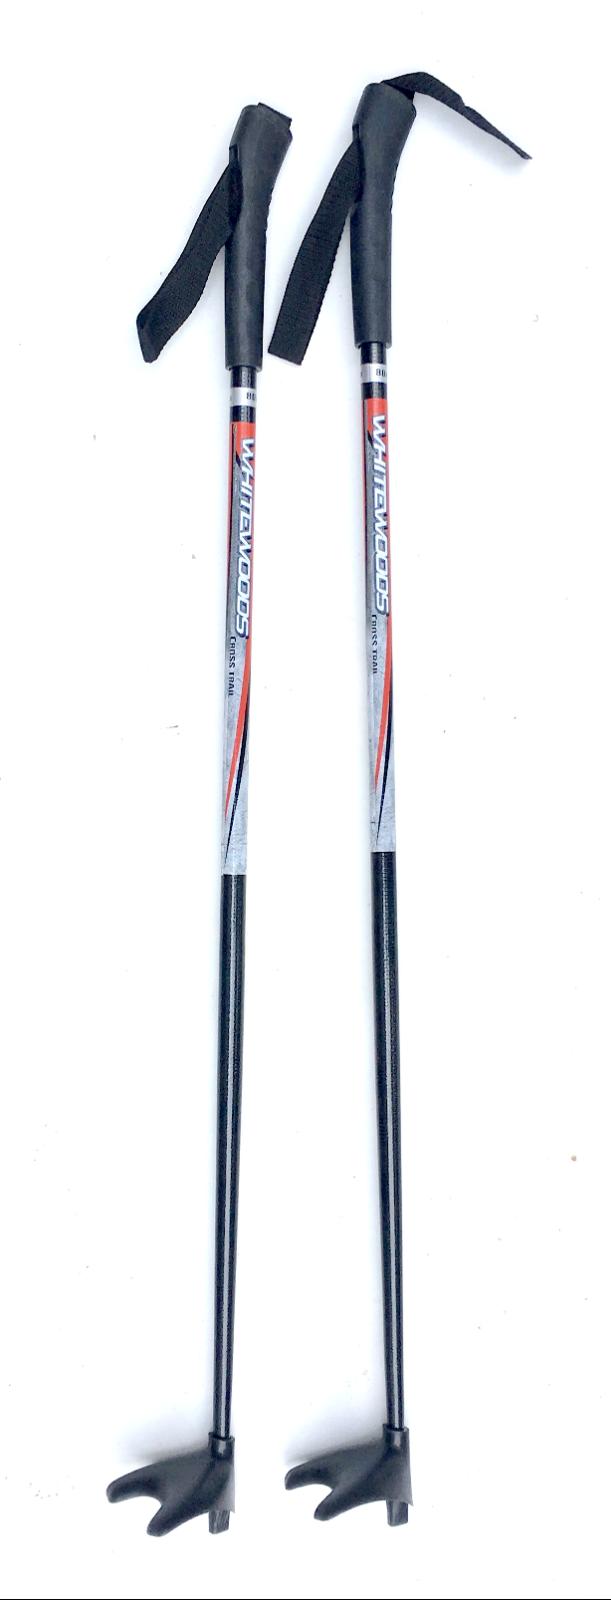 Weißwoods Junior Ski Poles with Snow Basket 80cm